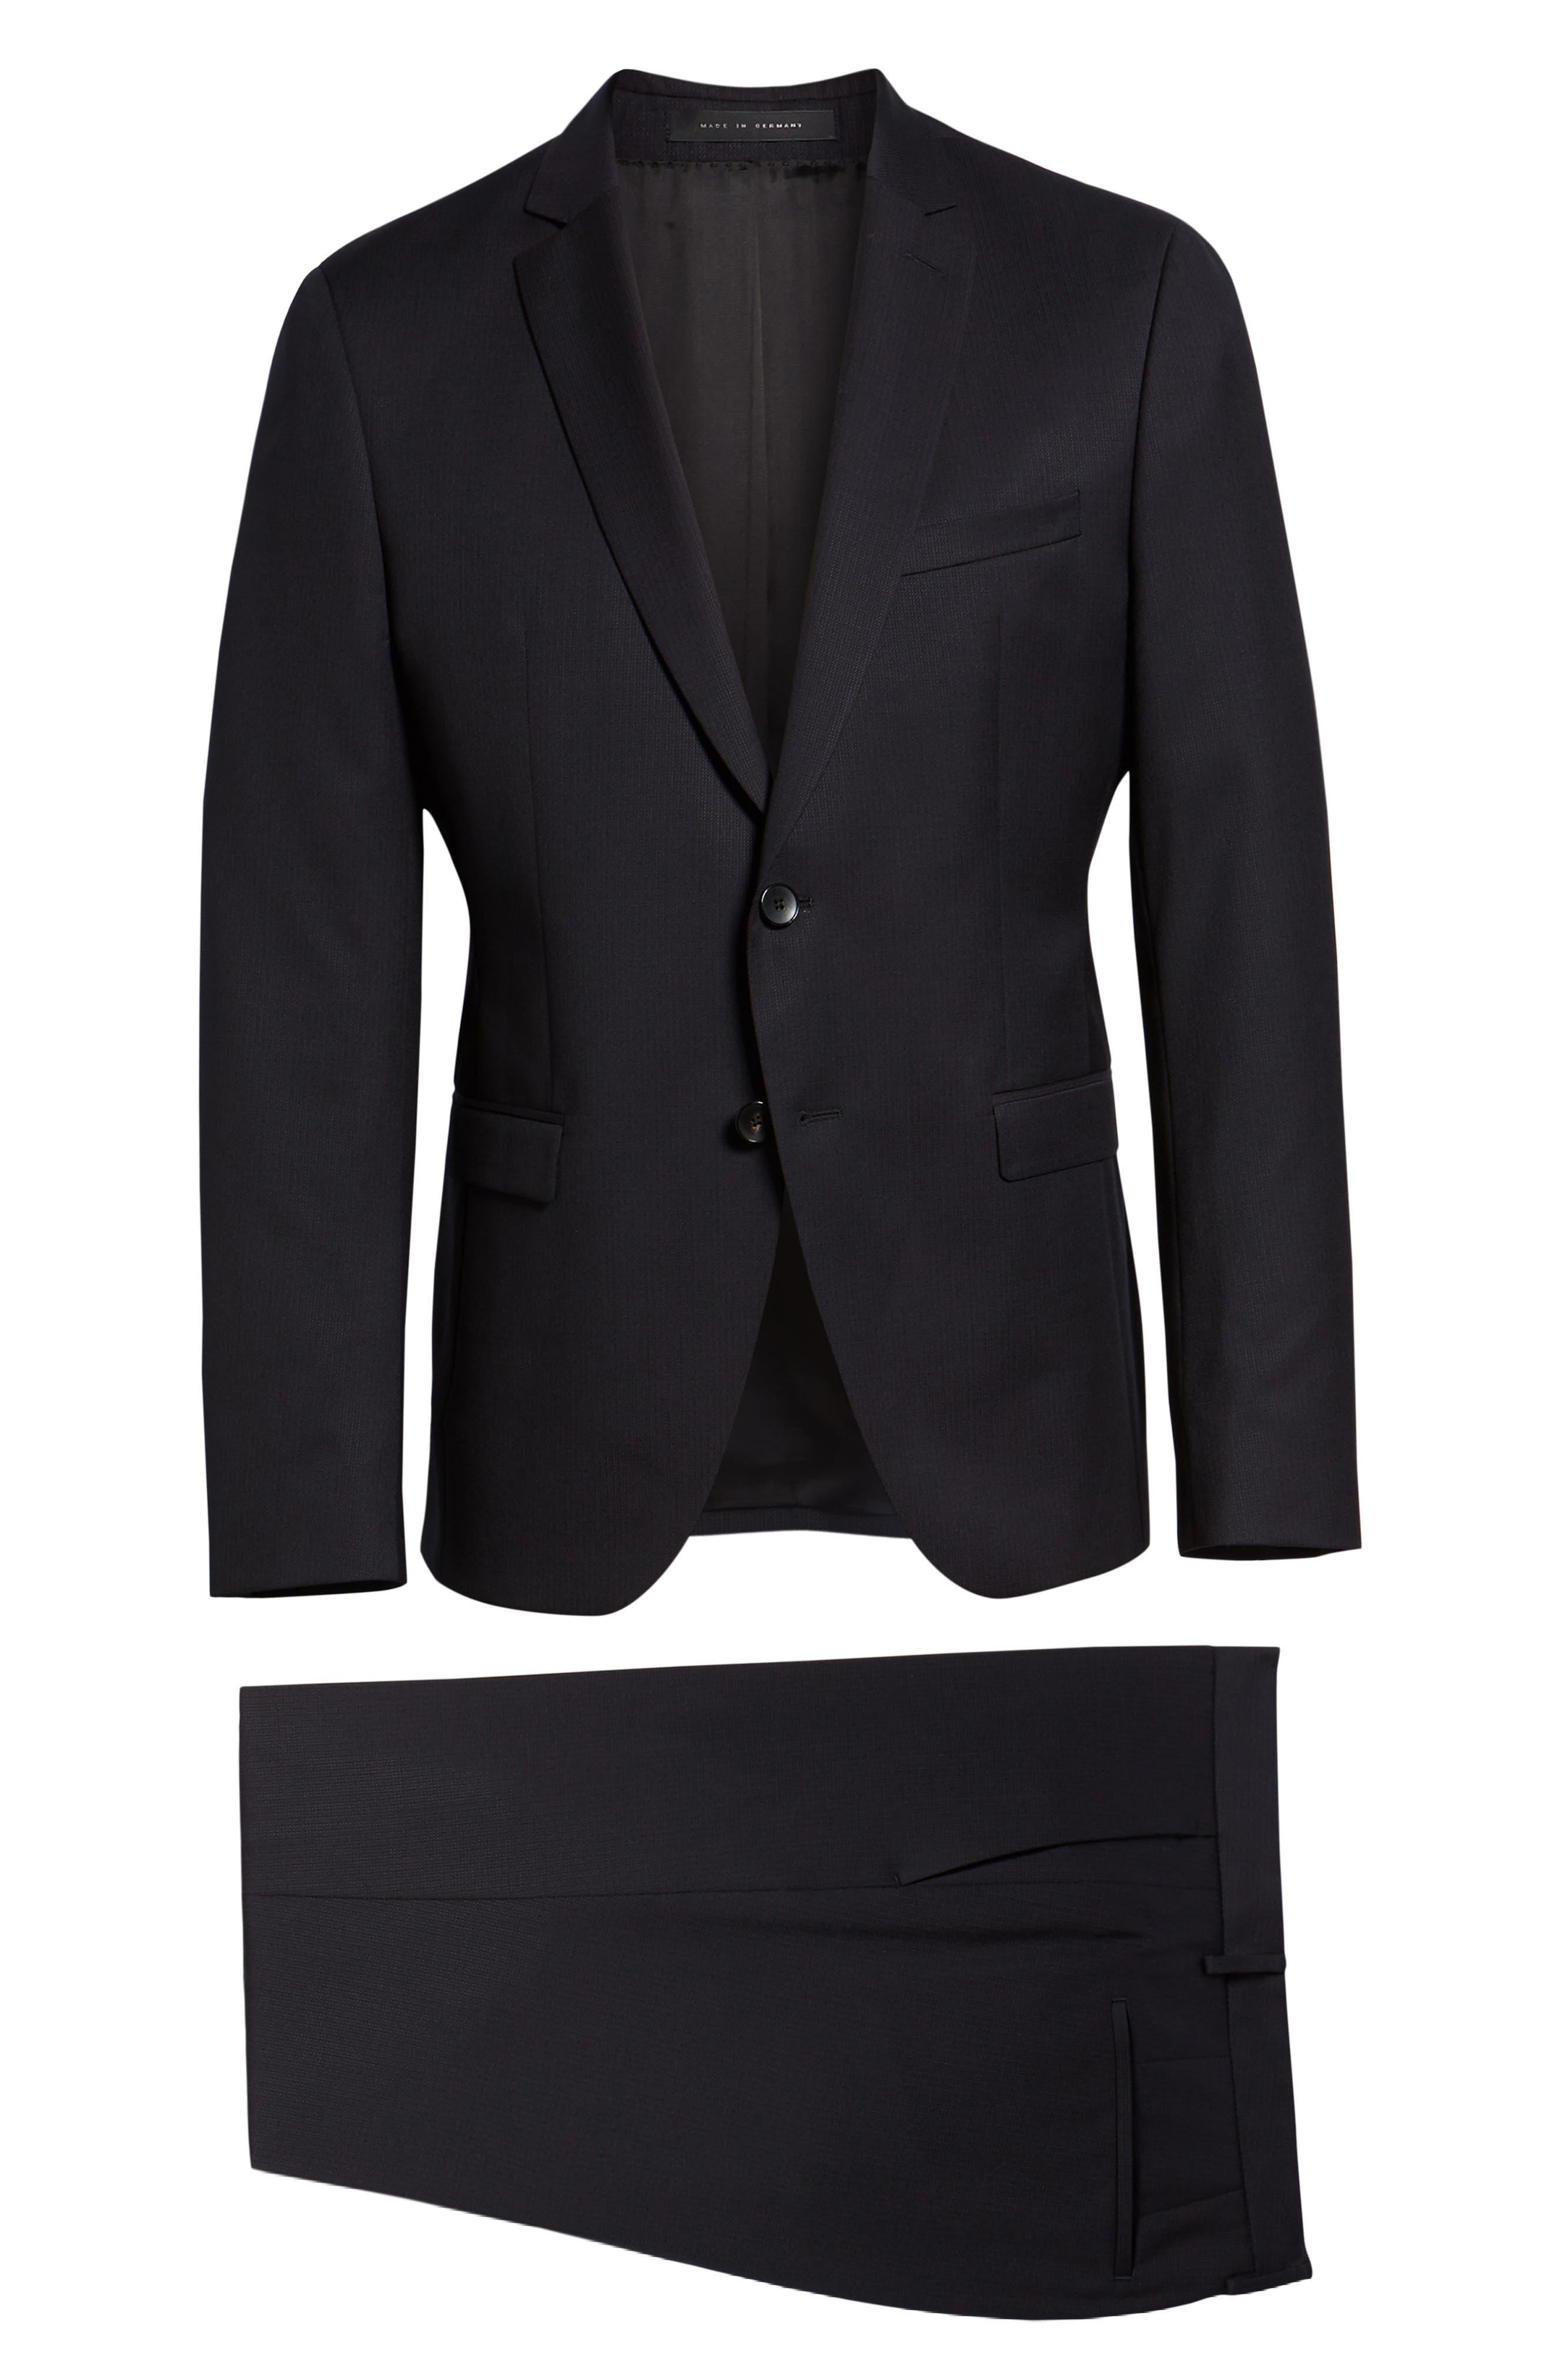 Reymond/Wenten Extra Trim Fit Solid Wool Suit,                             Alternate thumbnail 8, color,                             DARK PURPLE